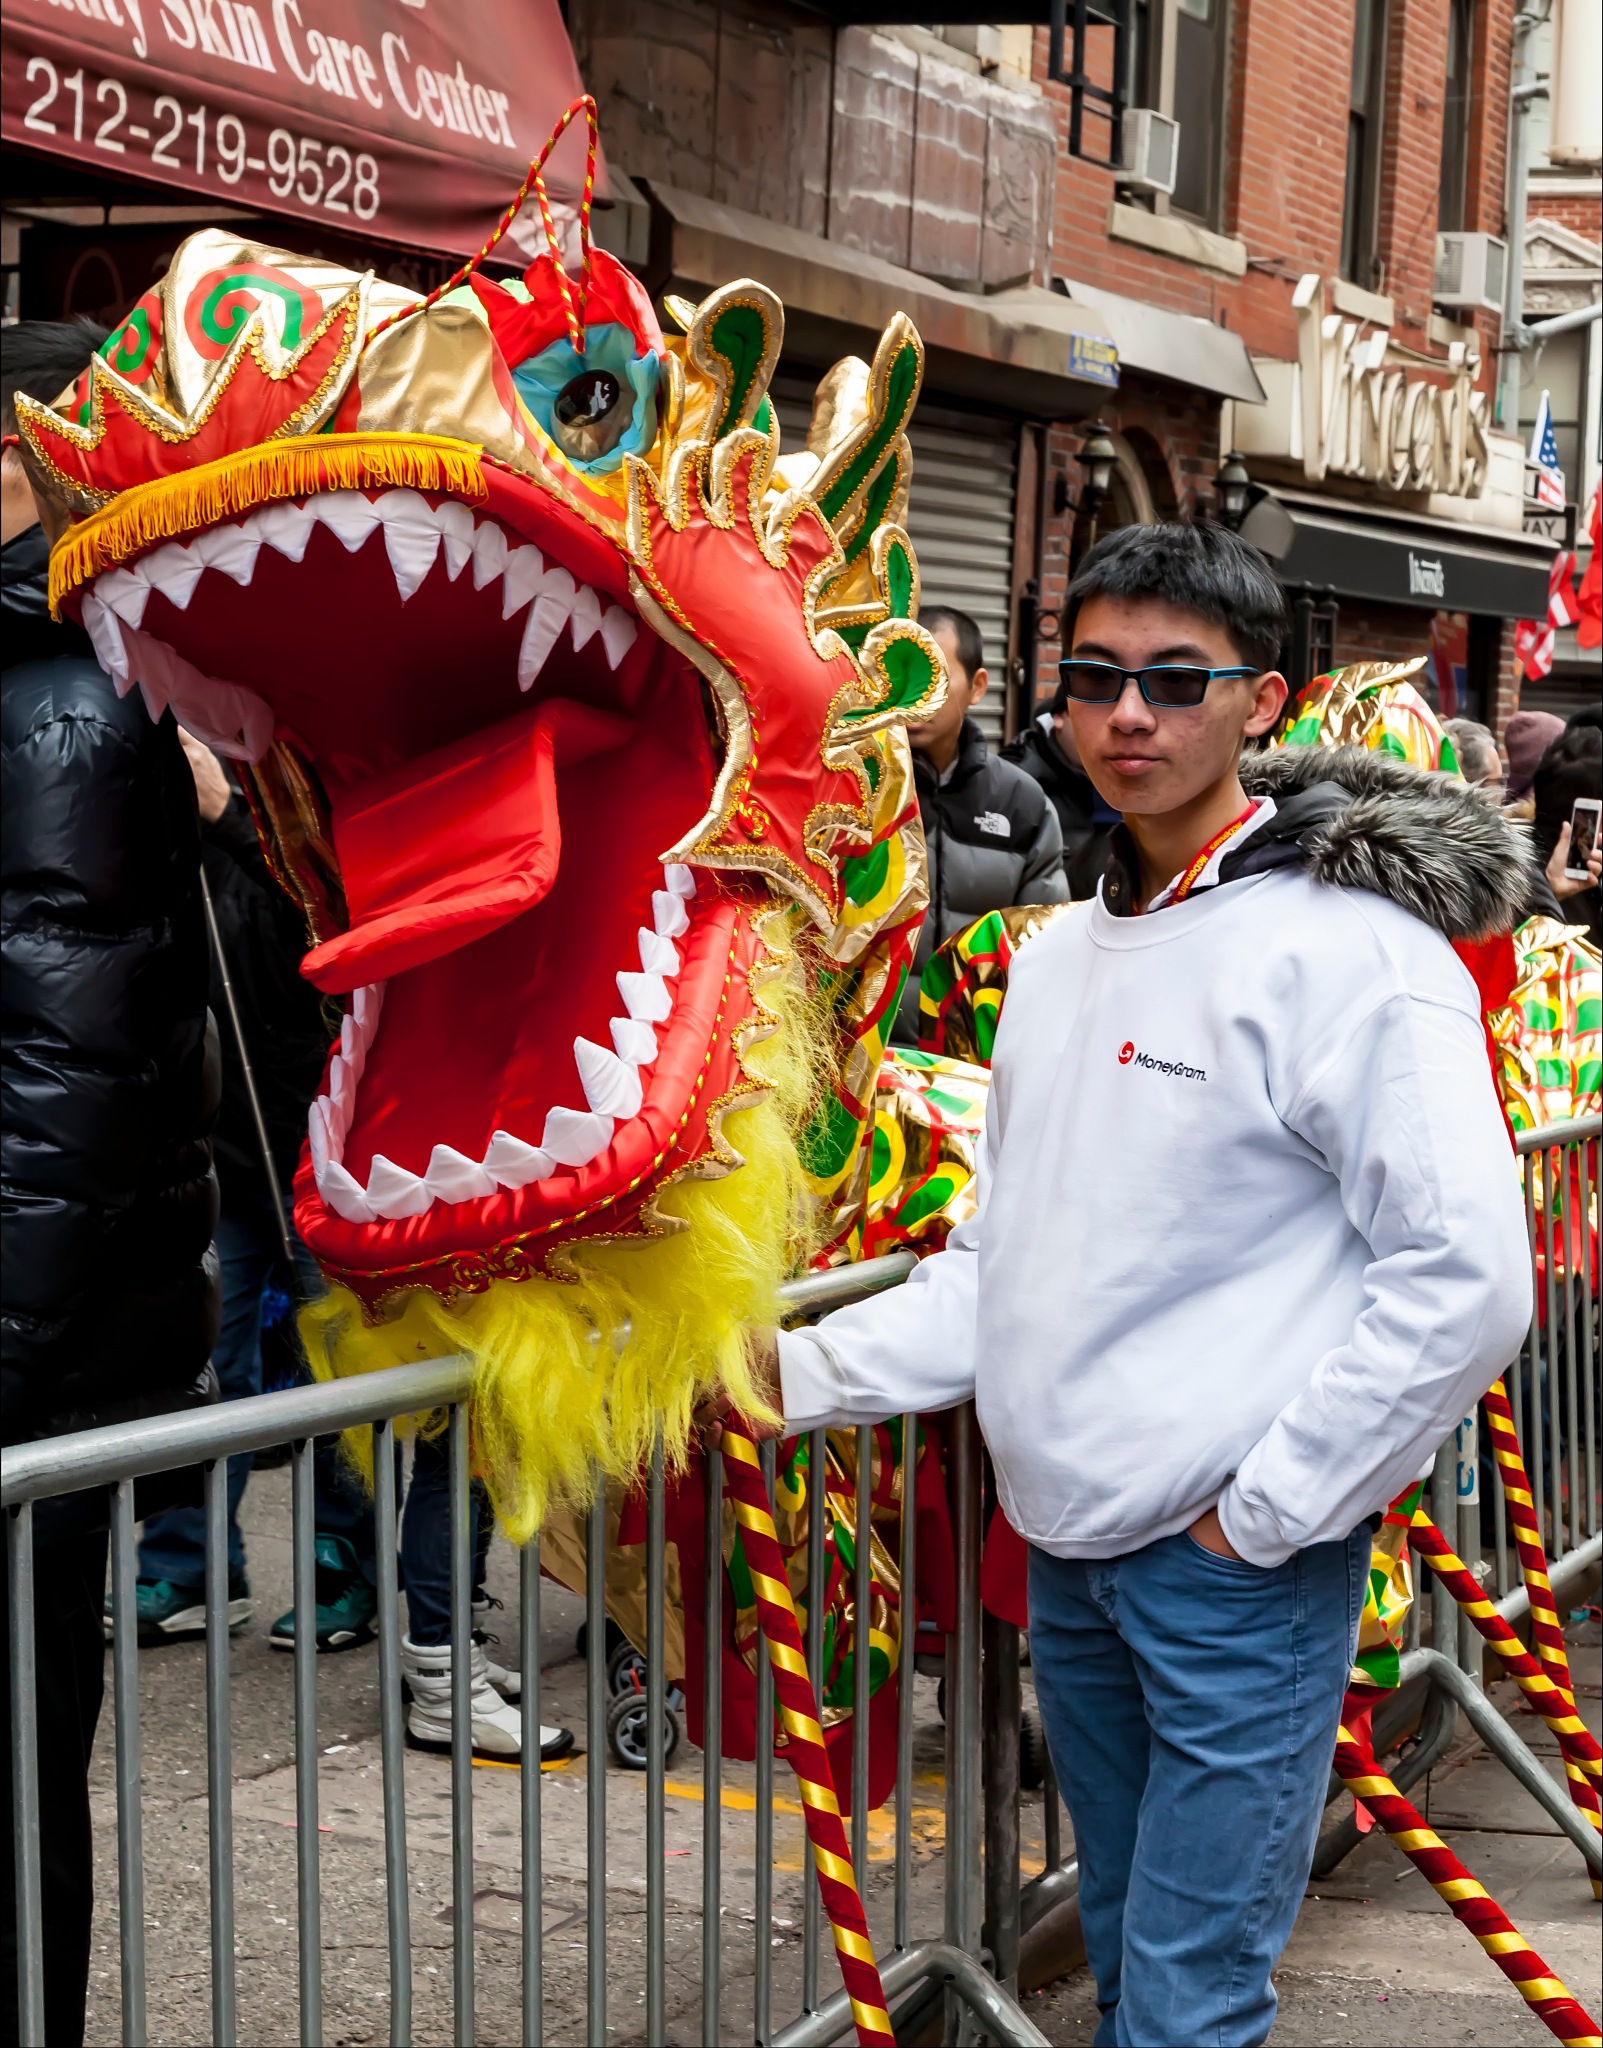 Lunar New Year NYC 2017 Lion Dance Costume by robertullmann